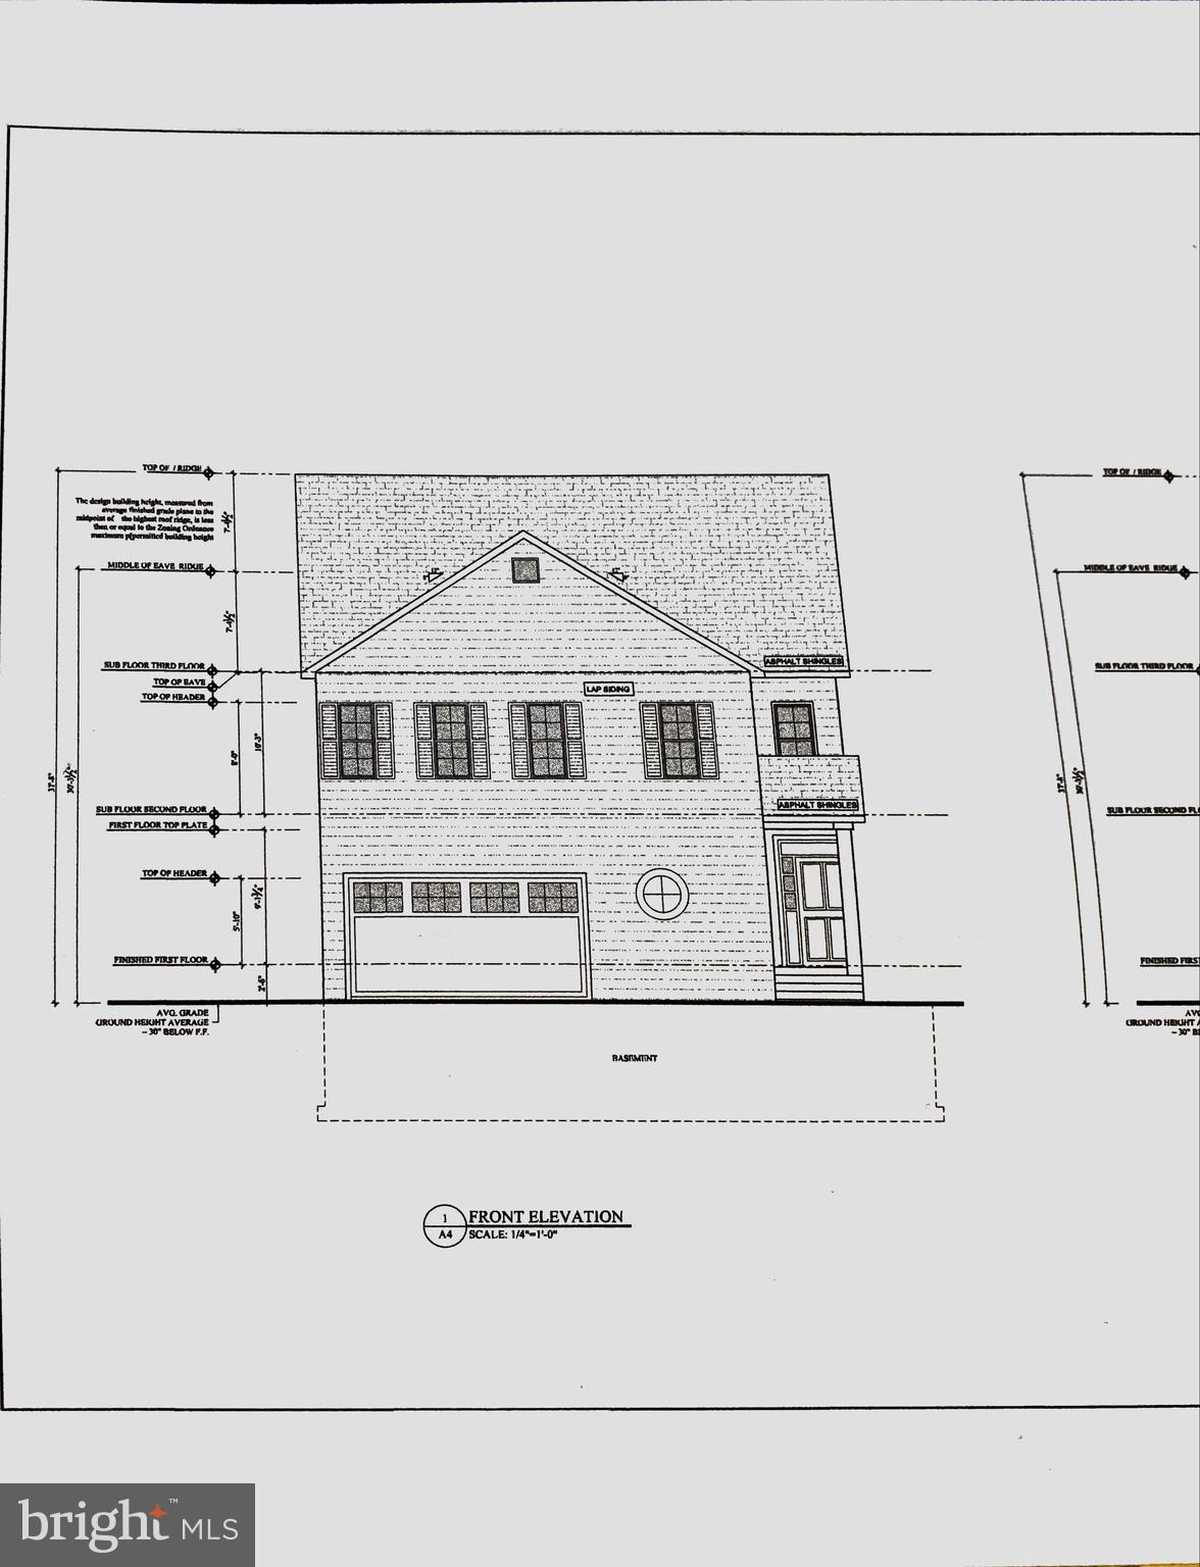 $1,218,000 - 6Br/6Ba -  for Sale in Fairmont Estates, Fairfax